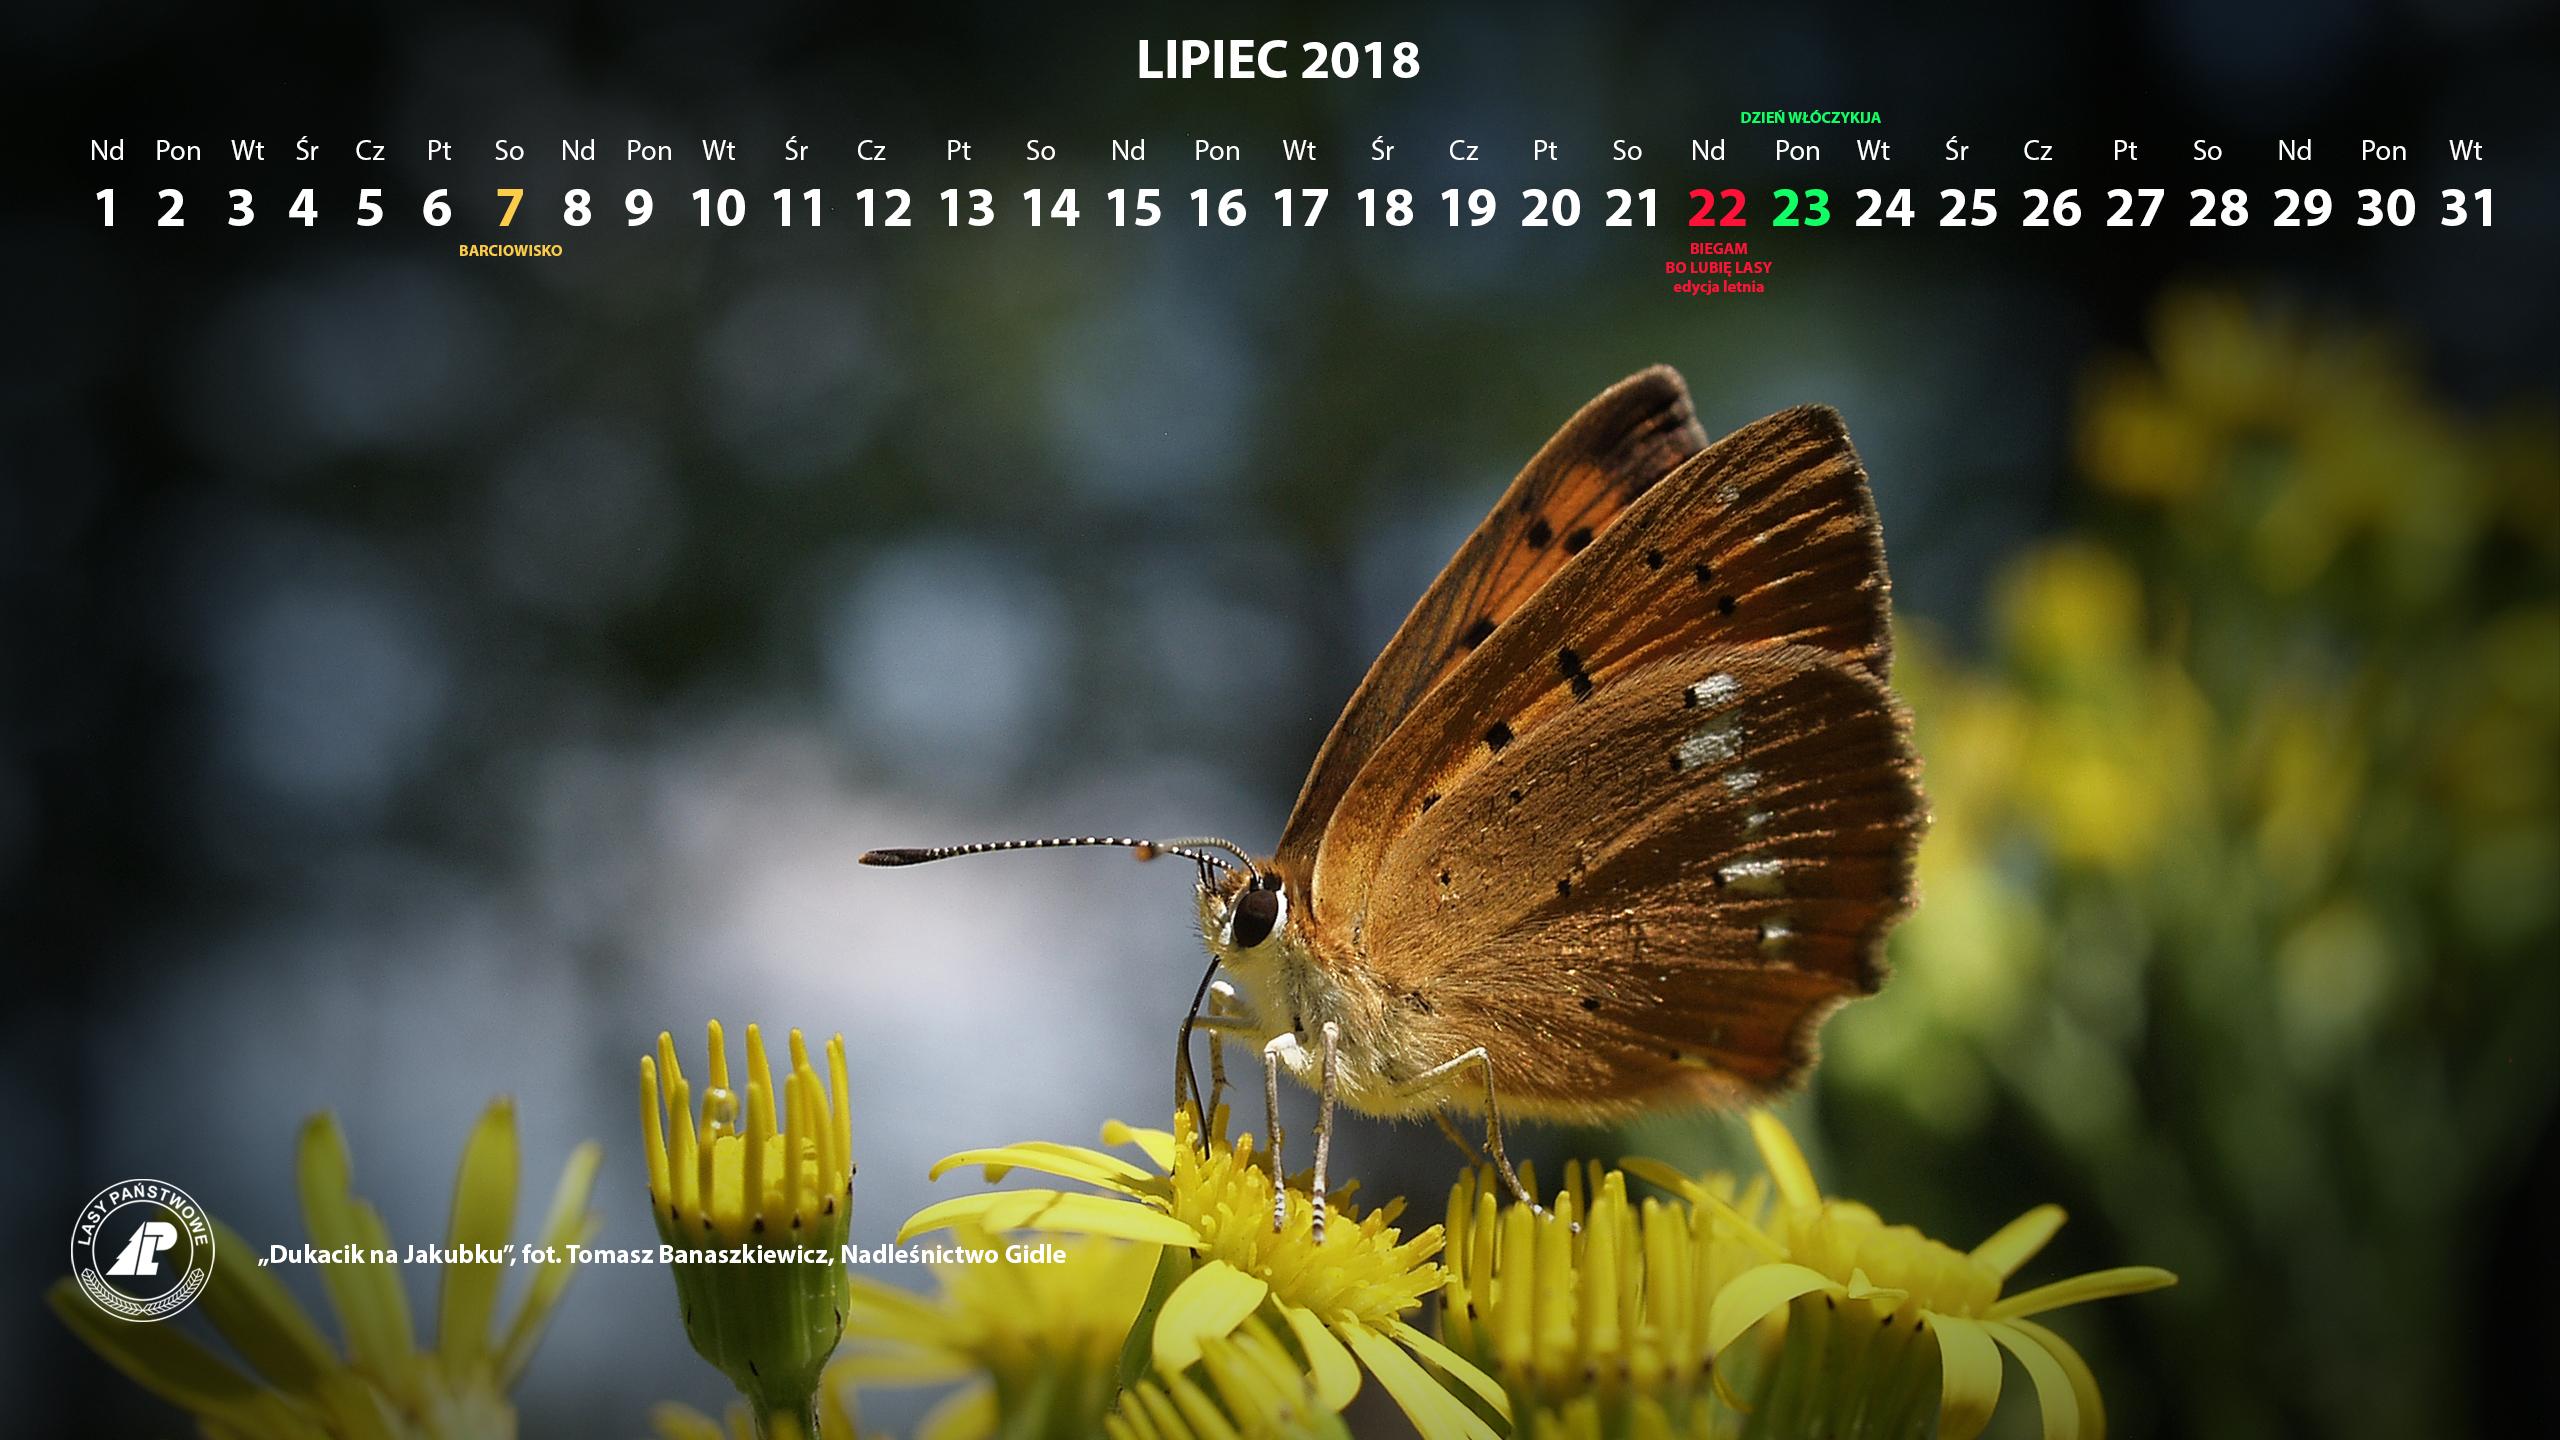 Kalendarz_lipiec_2018_2560x1440[1].jpg